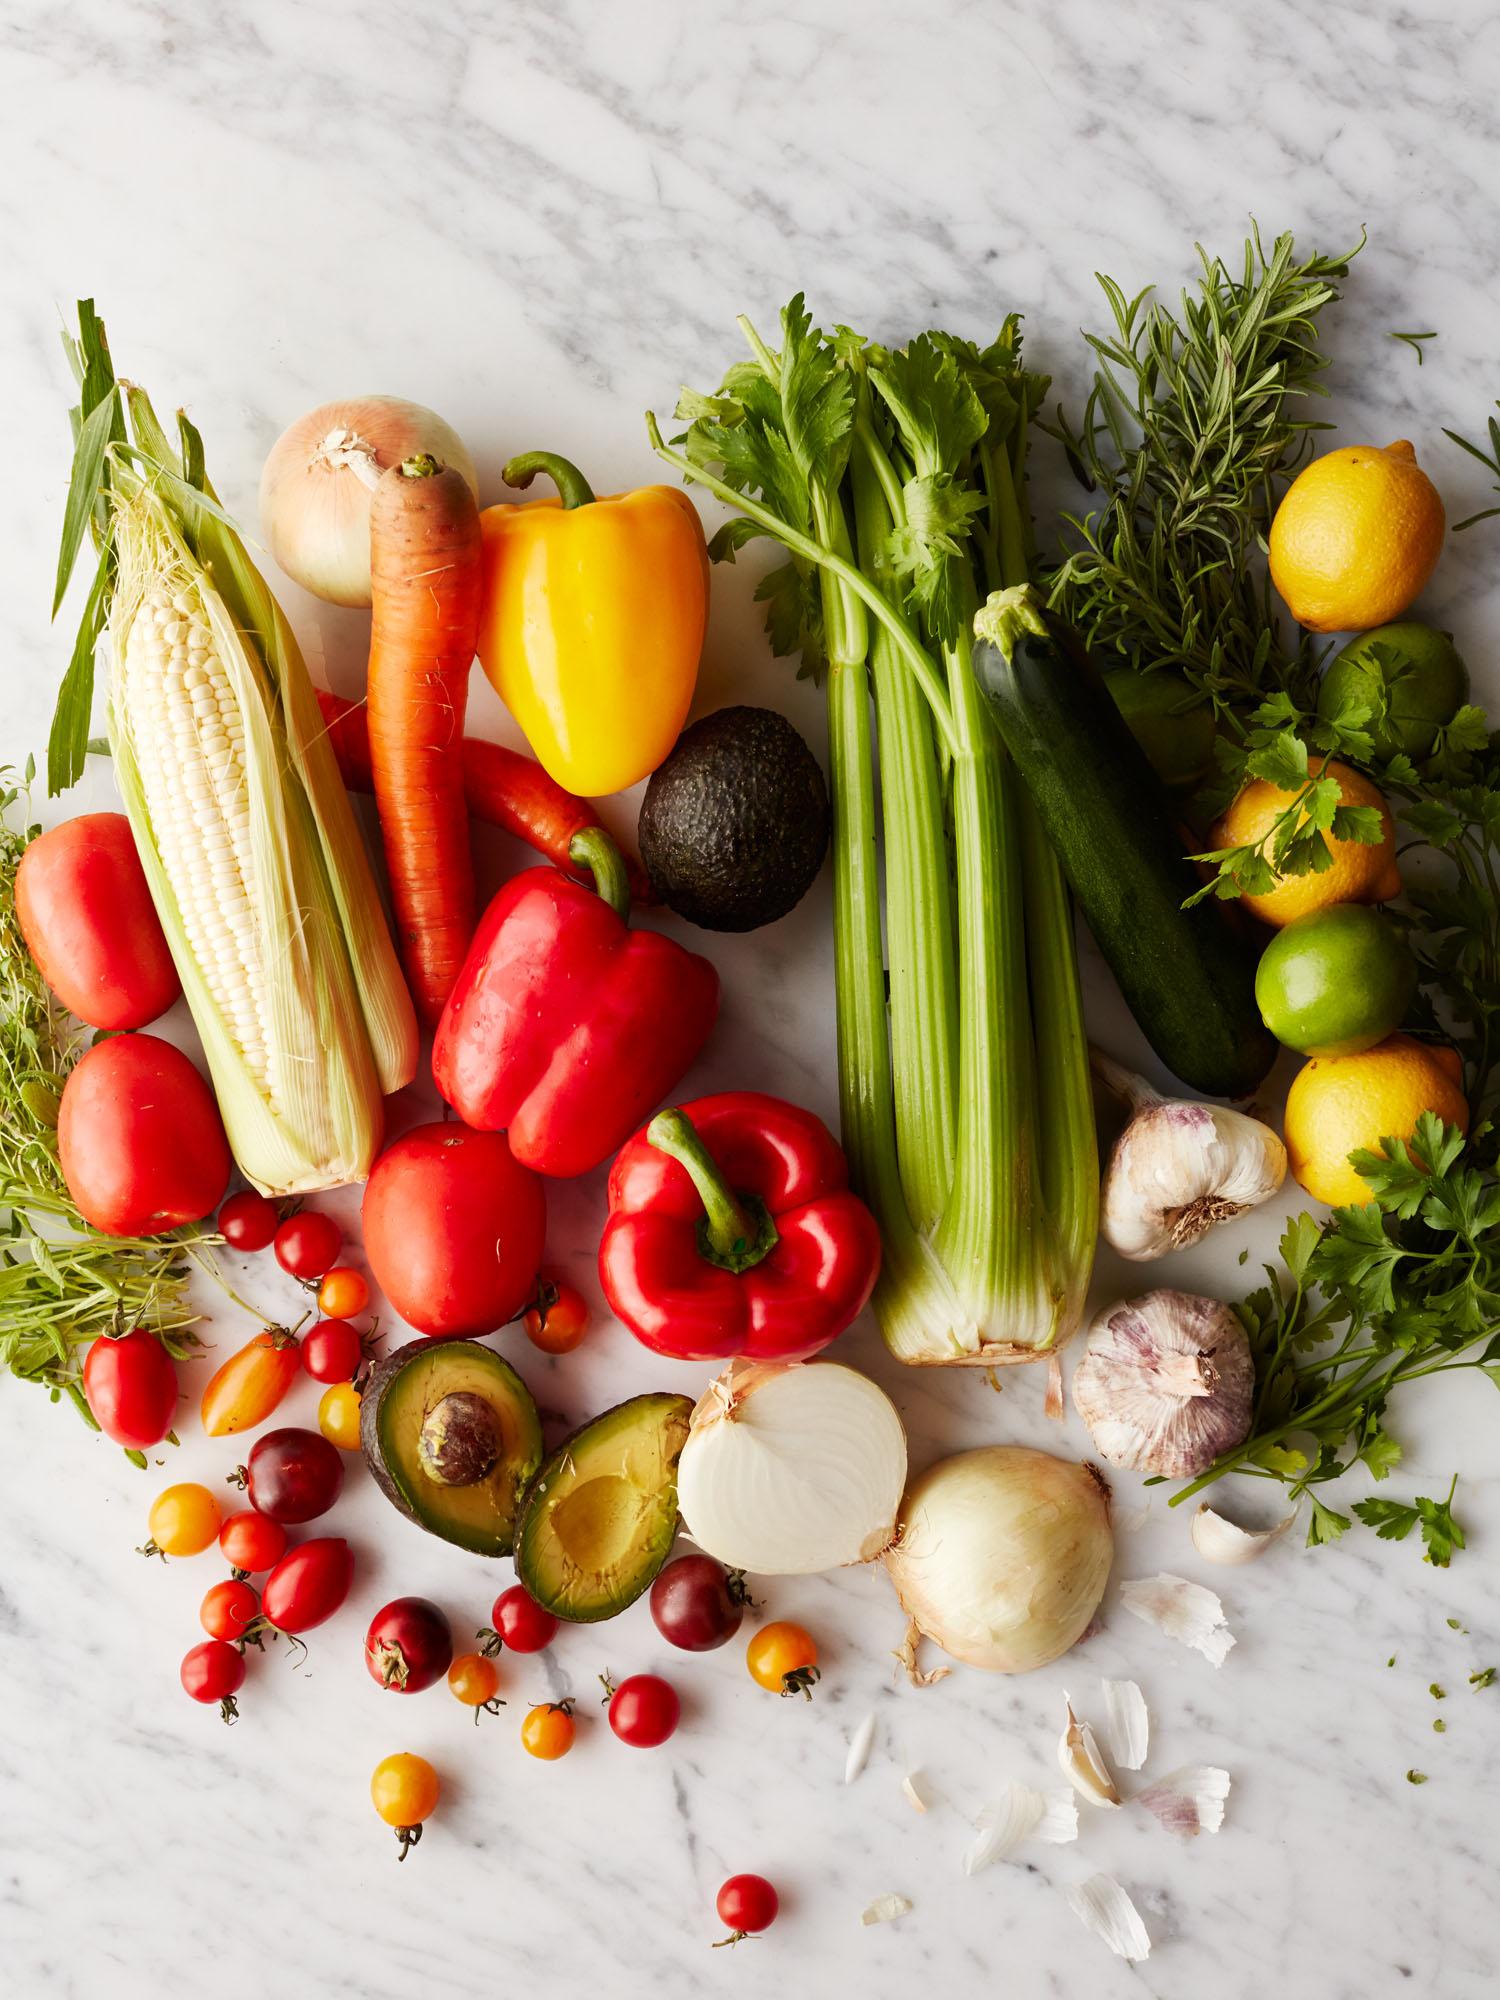 20160719_DrJulia_Vegetables017.jpg